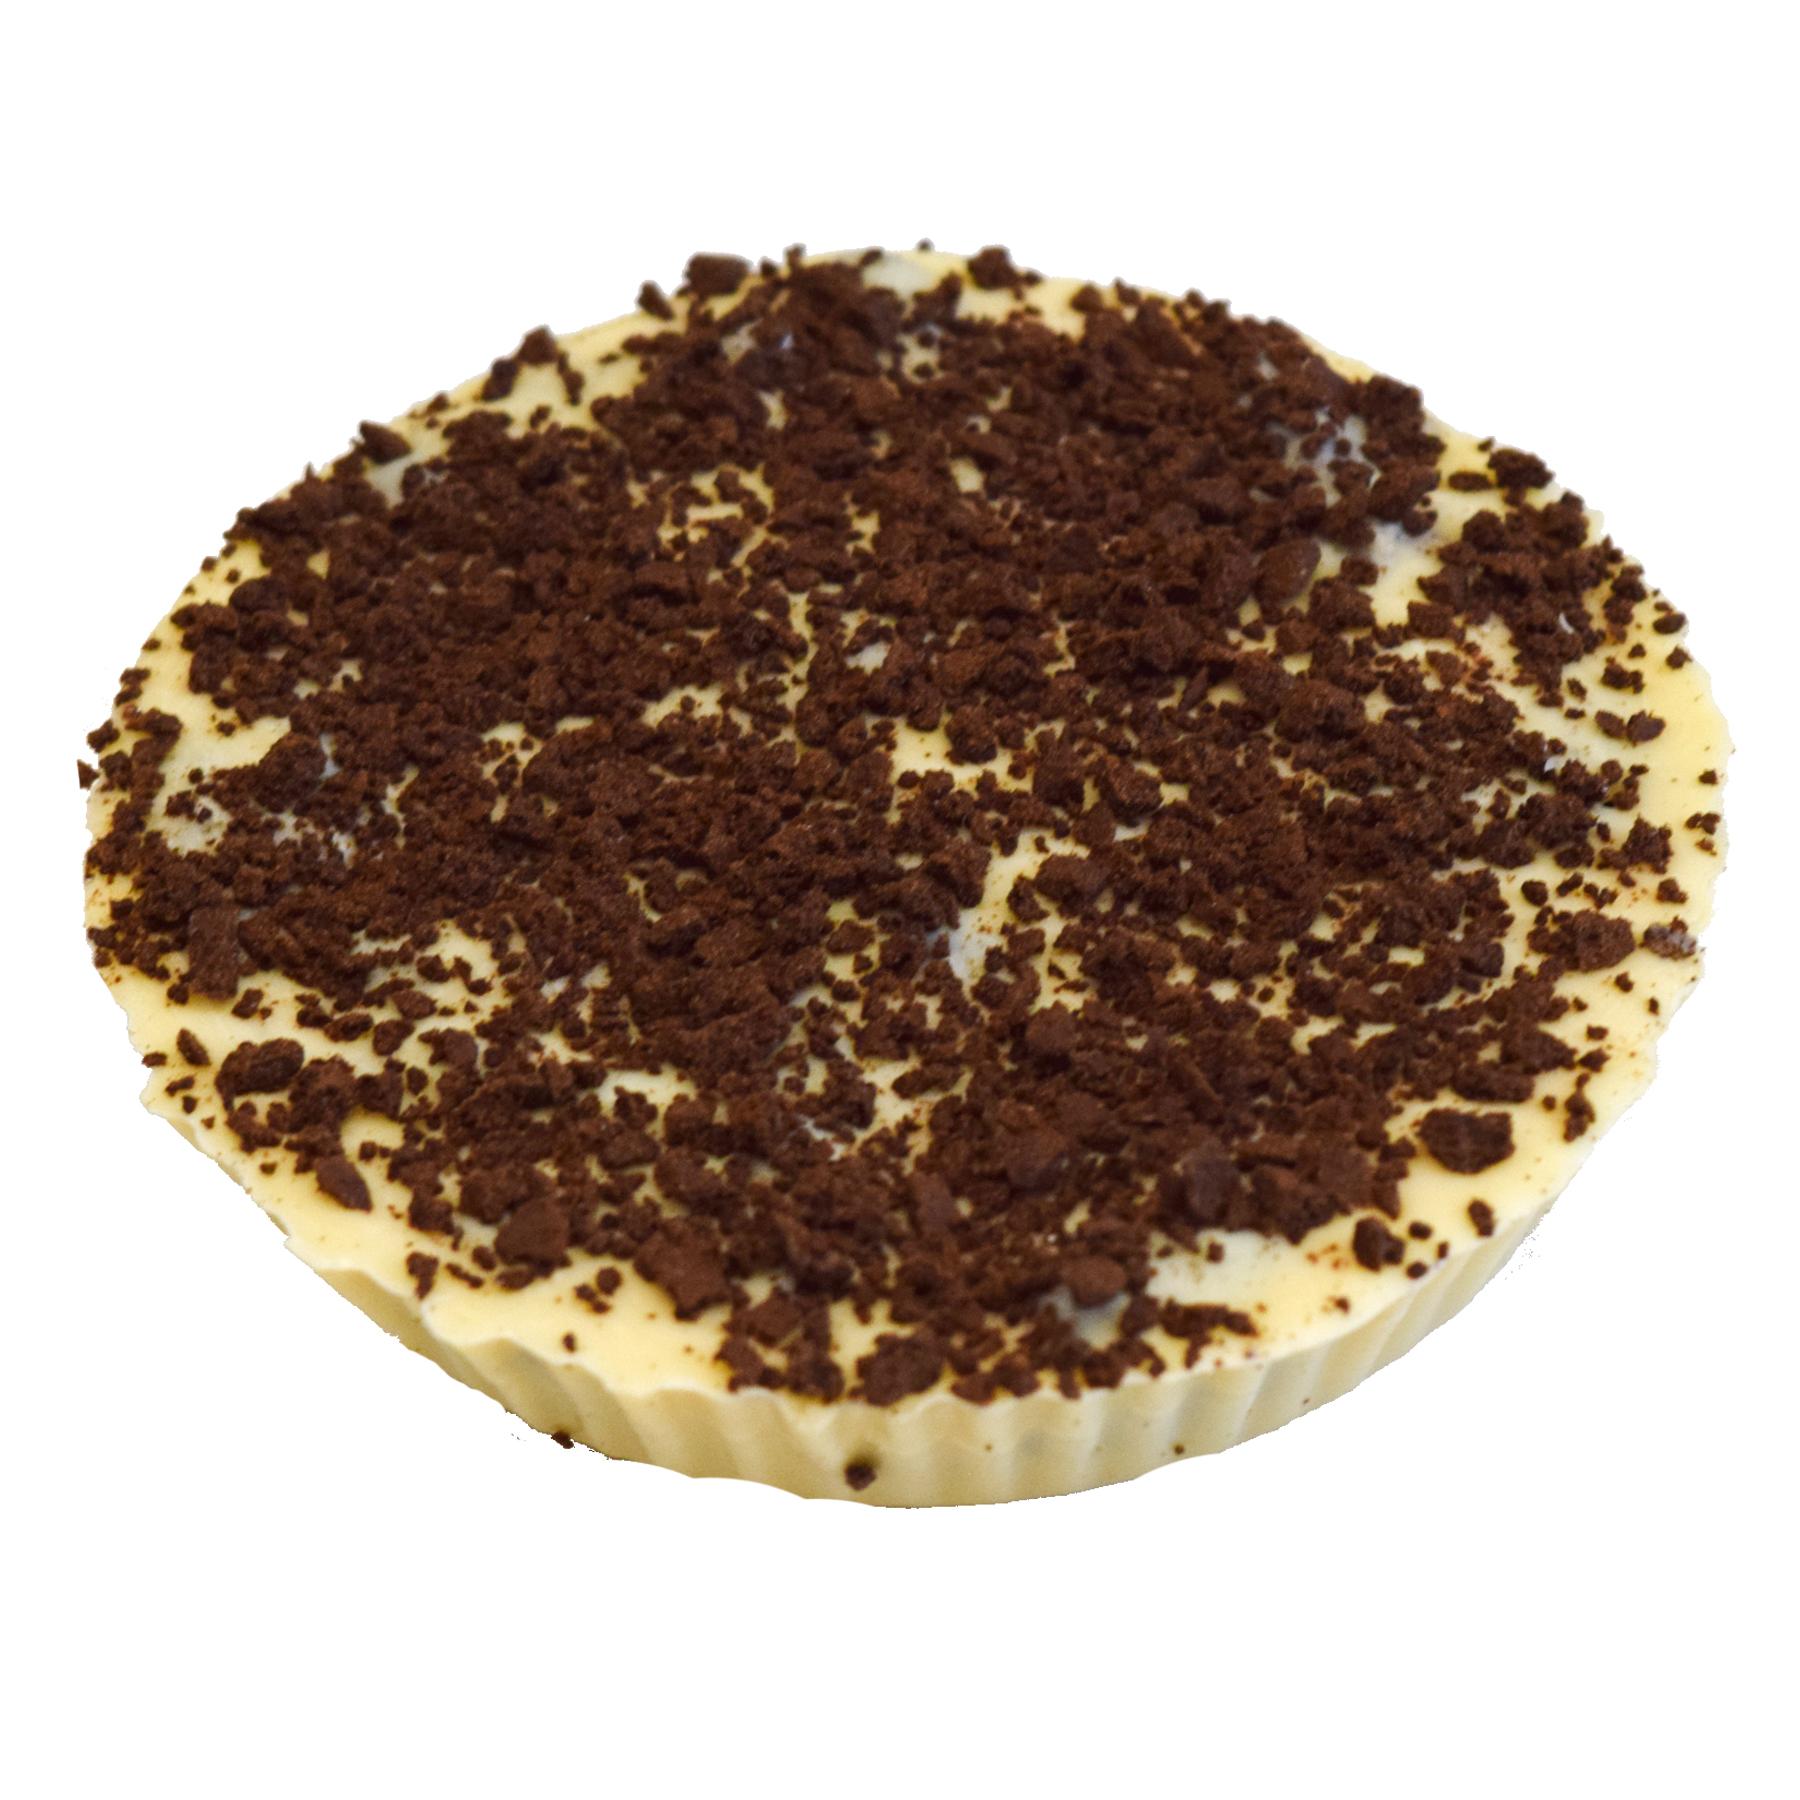 Cookies & Cream Cup 5.5oz